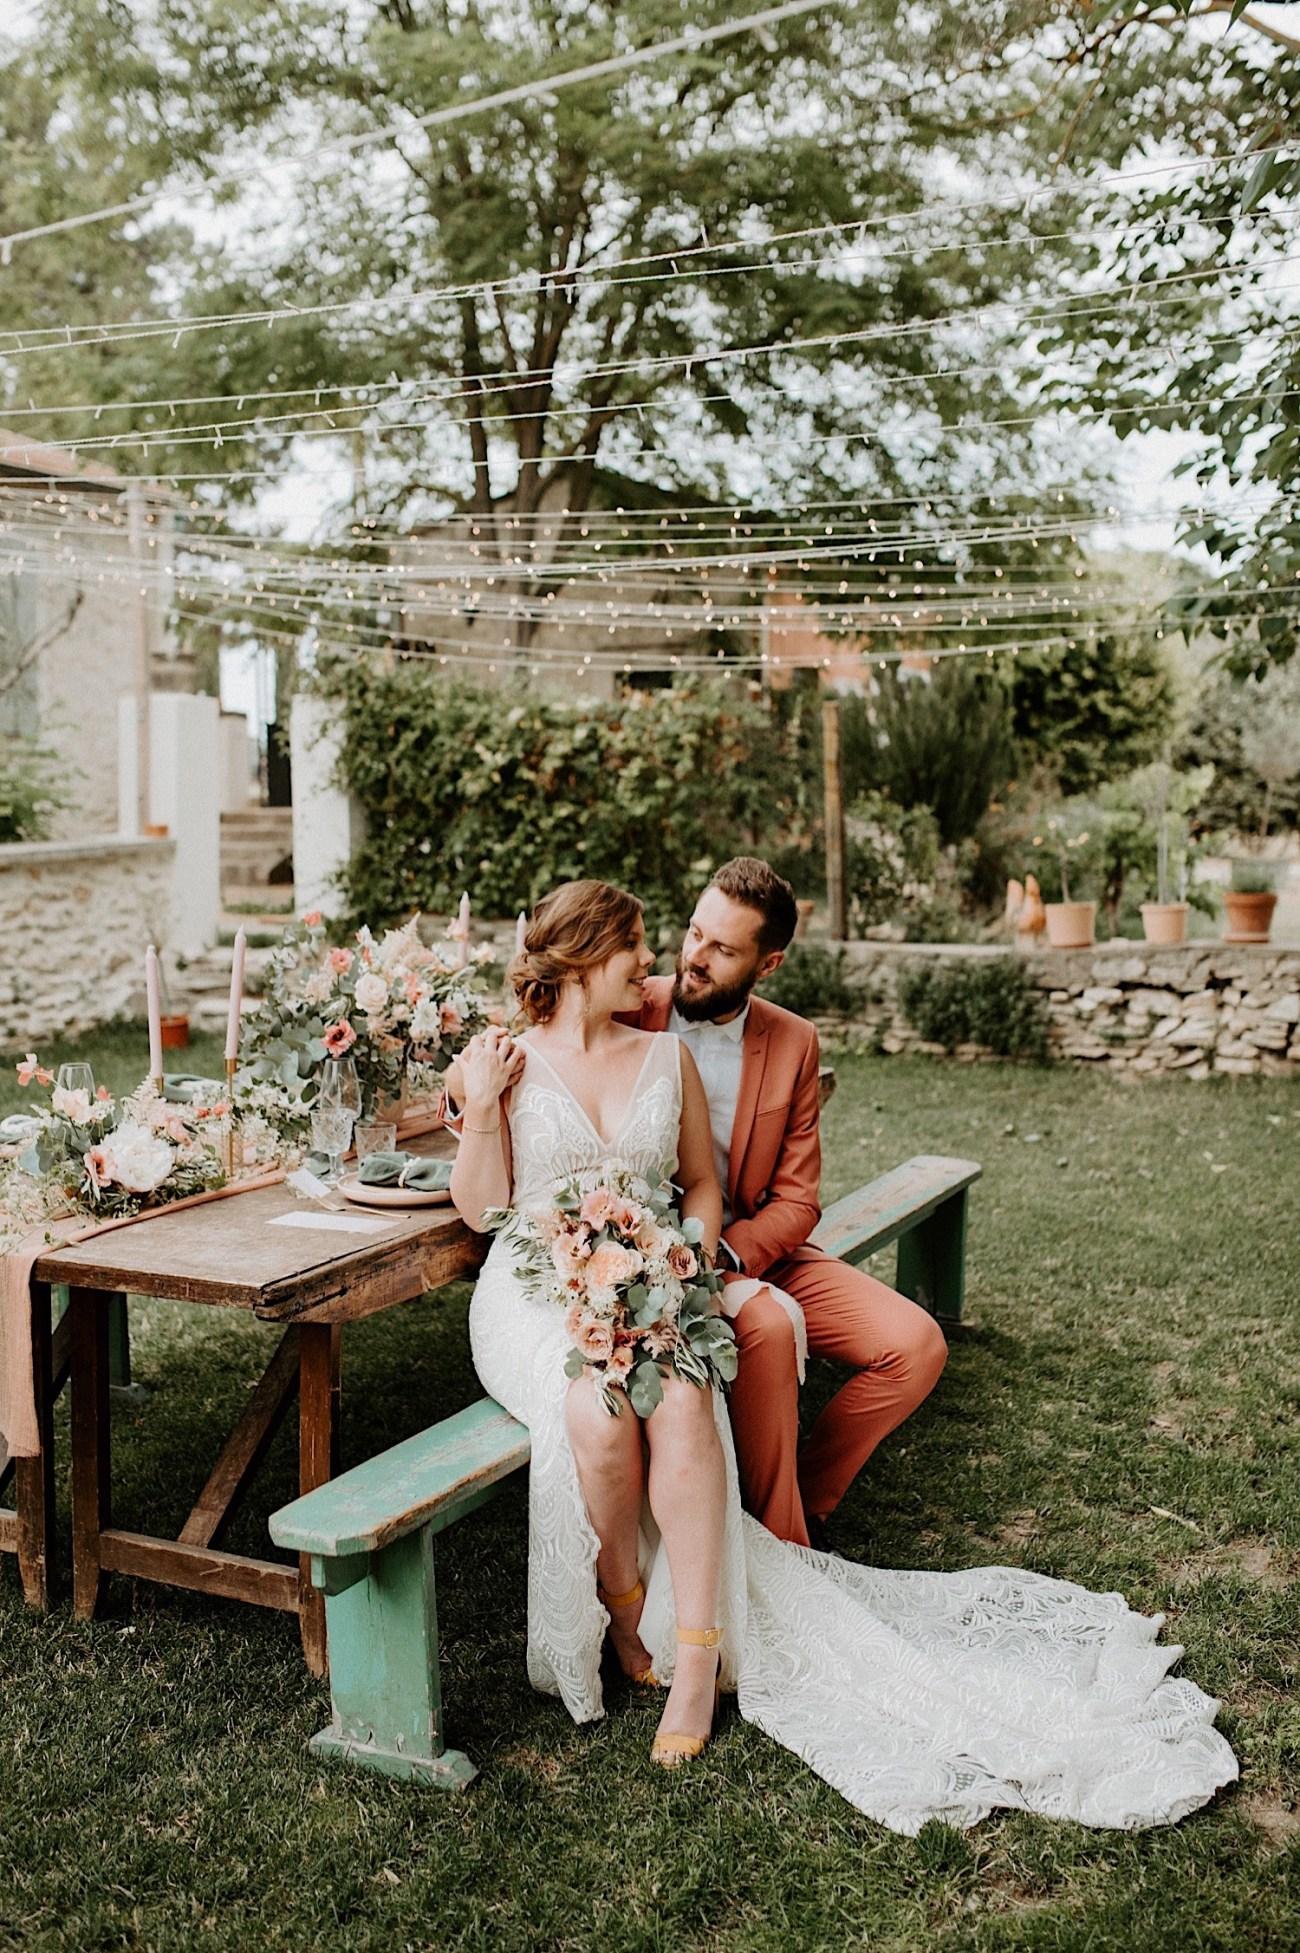 Terre Ugo Un Marriage En Provence Lavender Field Wedding French Wedding Provence Wedding Destination Wedding France Photographe De Marriage Provence France Anais Possamai Photography 14